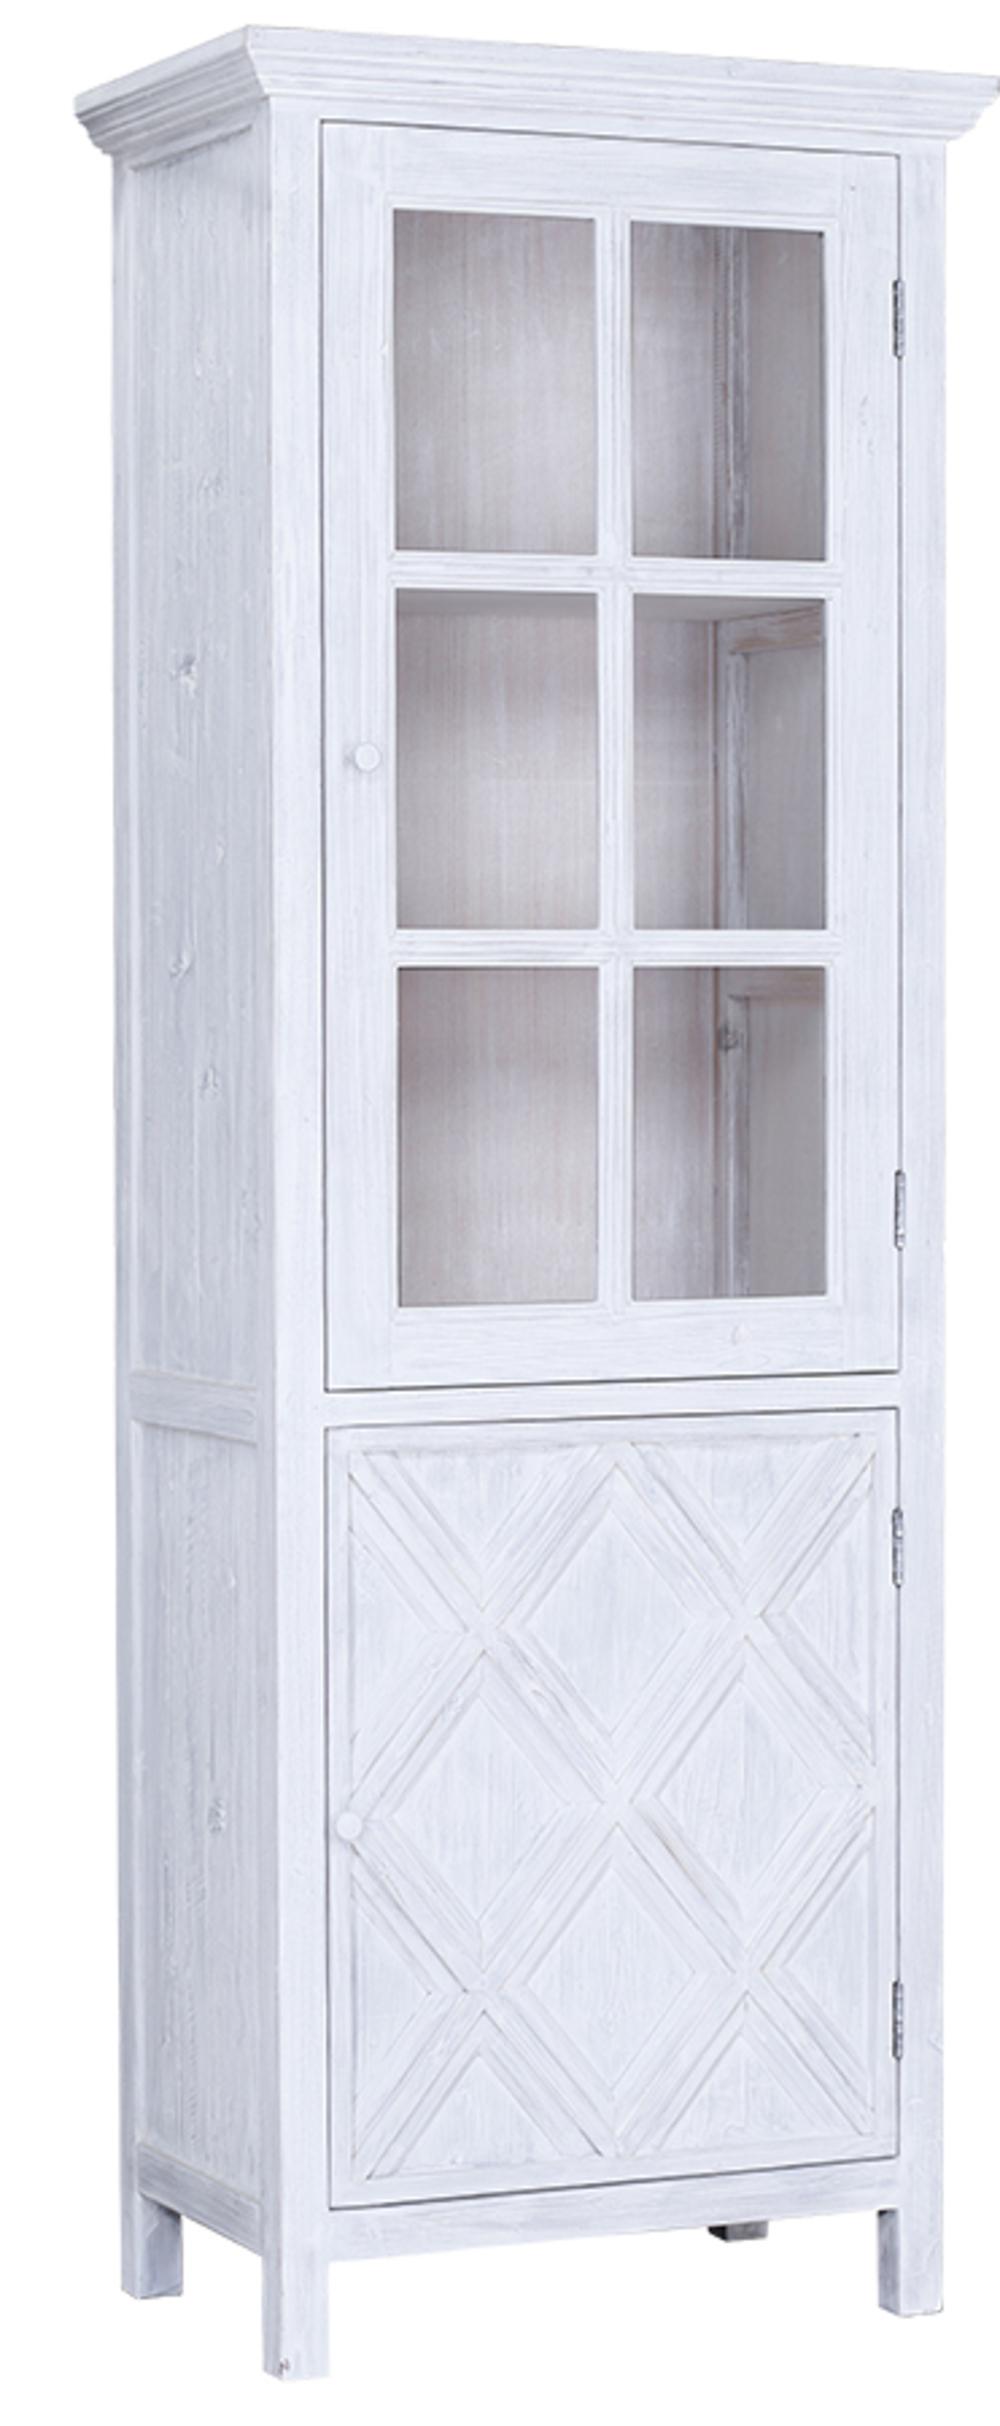 Dovetail Furniture - Santana Cabinet